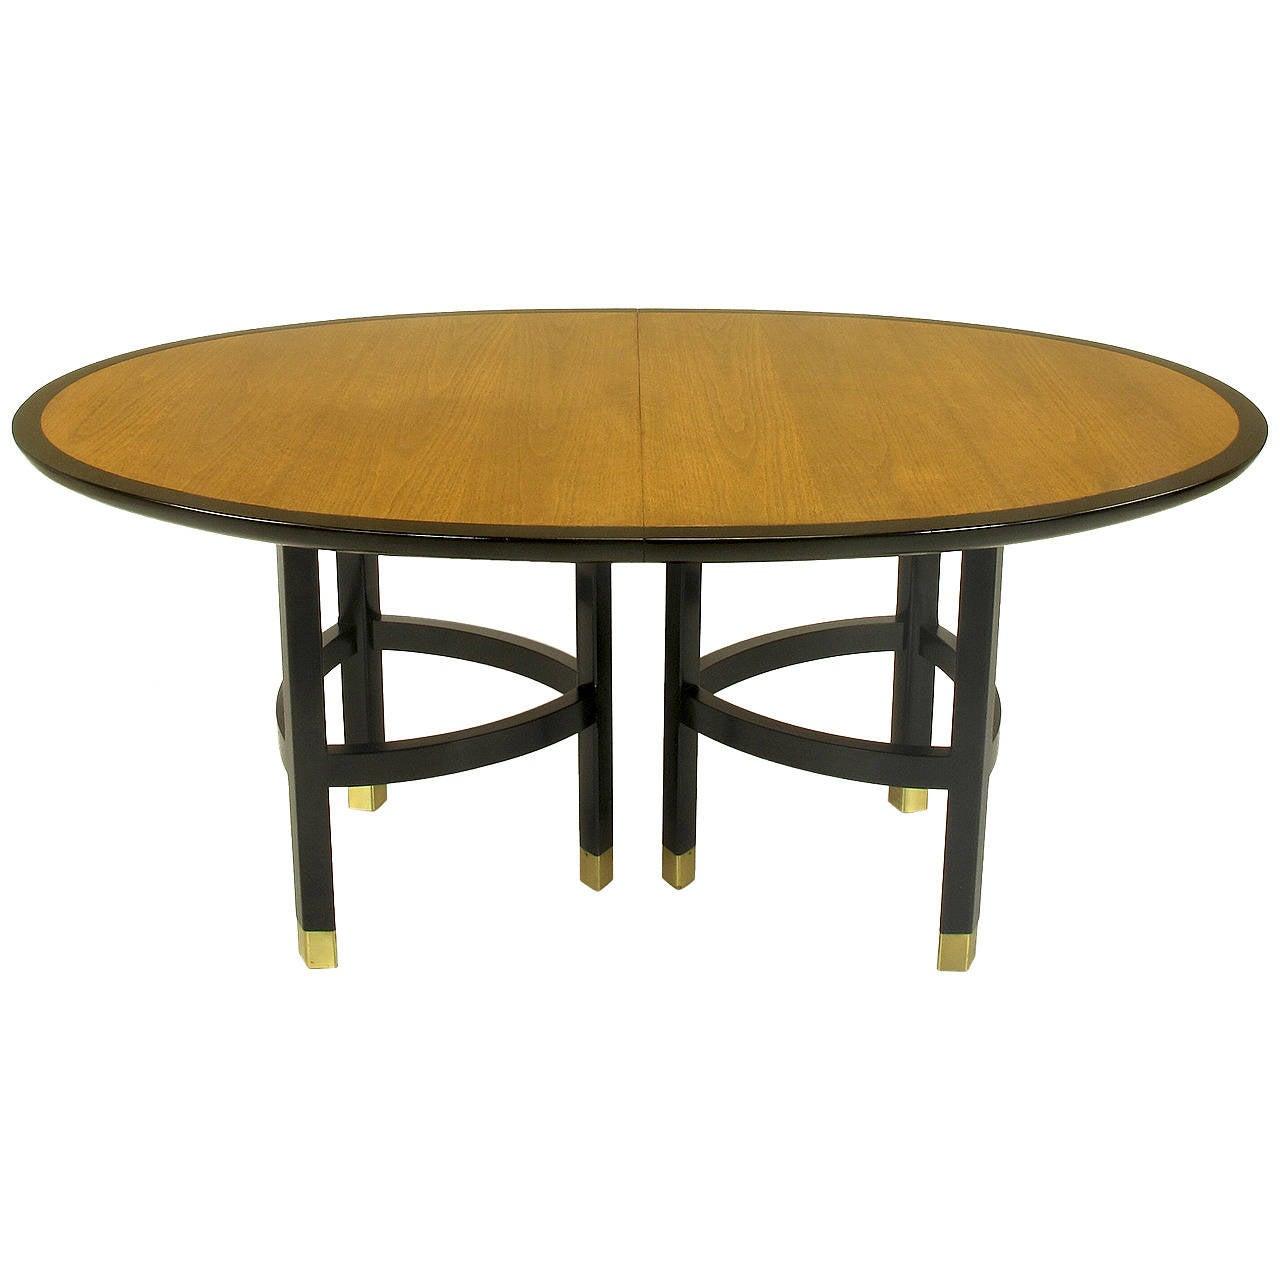 Baker Walnut and Ebonized Mahogany Dining Table at 1stdibs : 1606592l from www.1stdibs.com size 1280 x 1280 jpeg 82kB